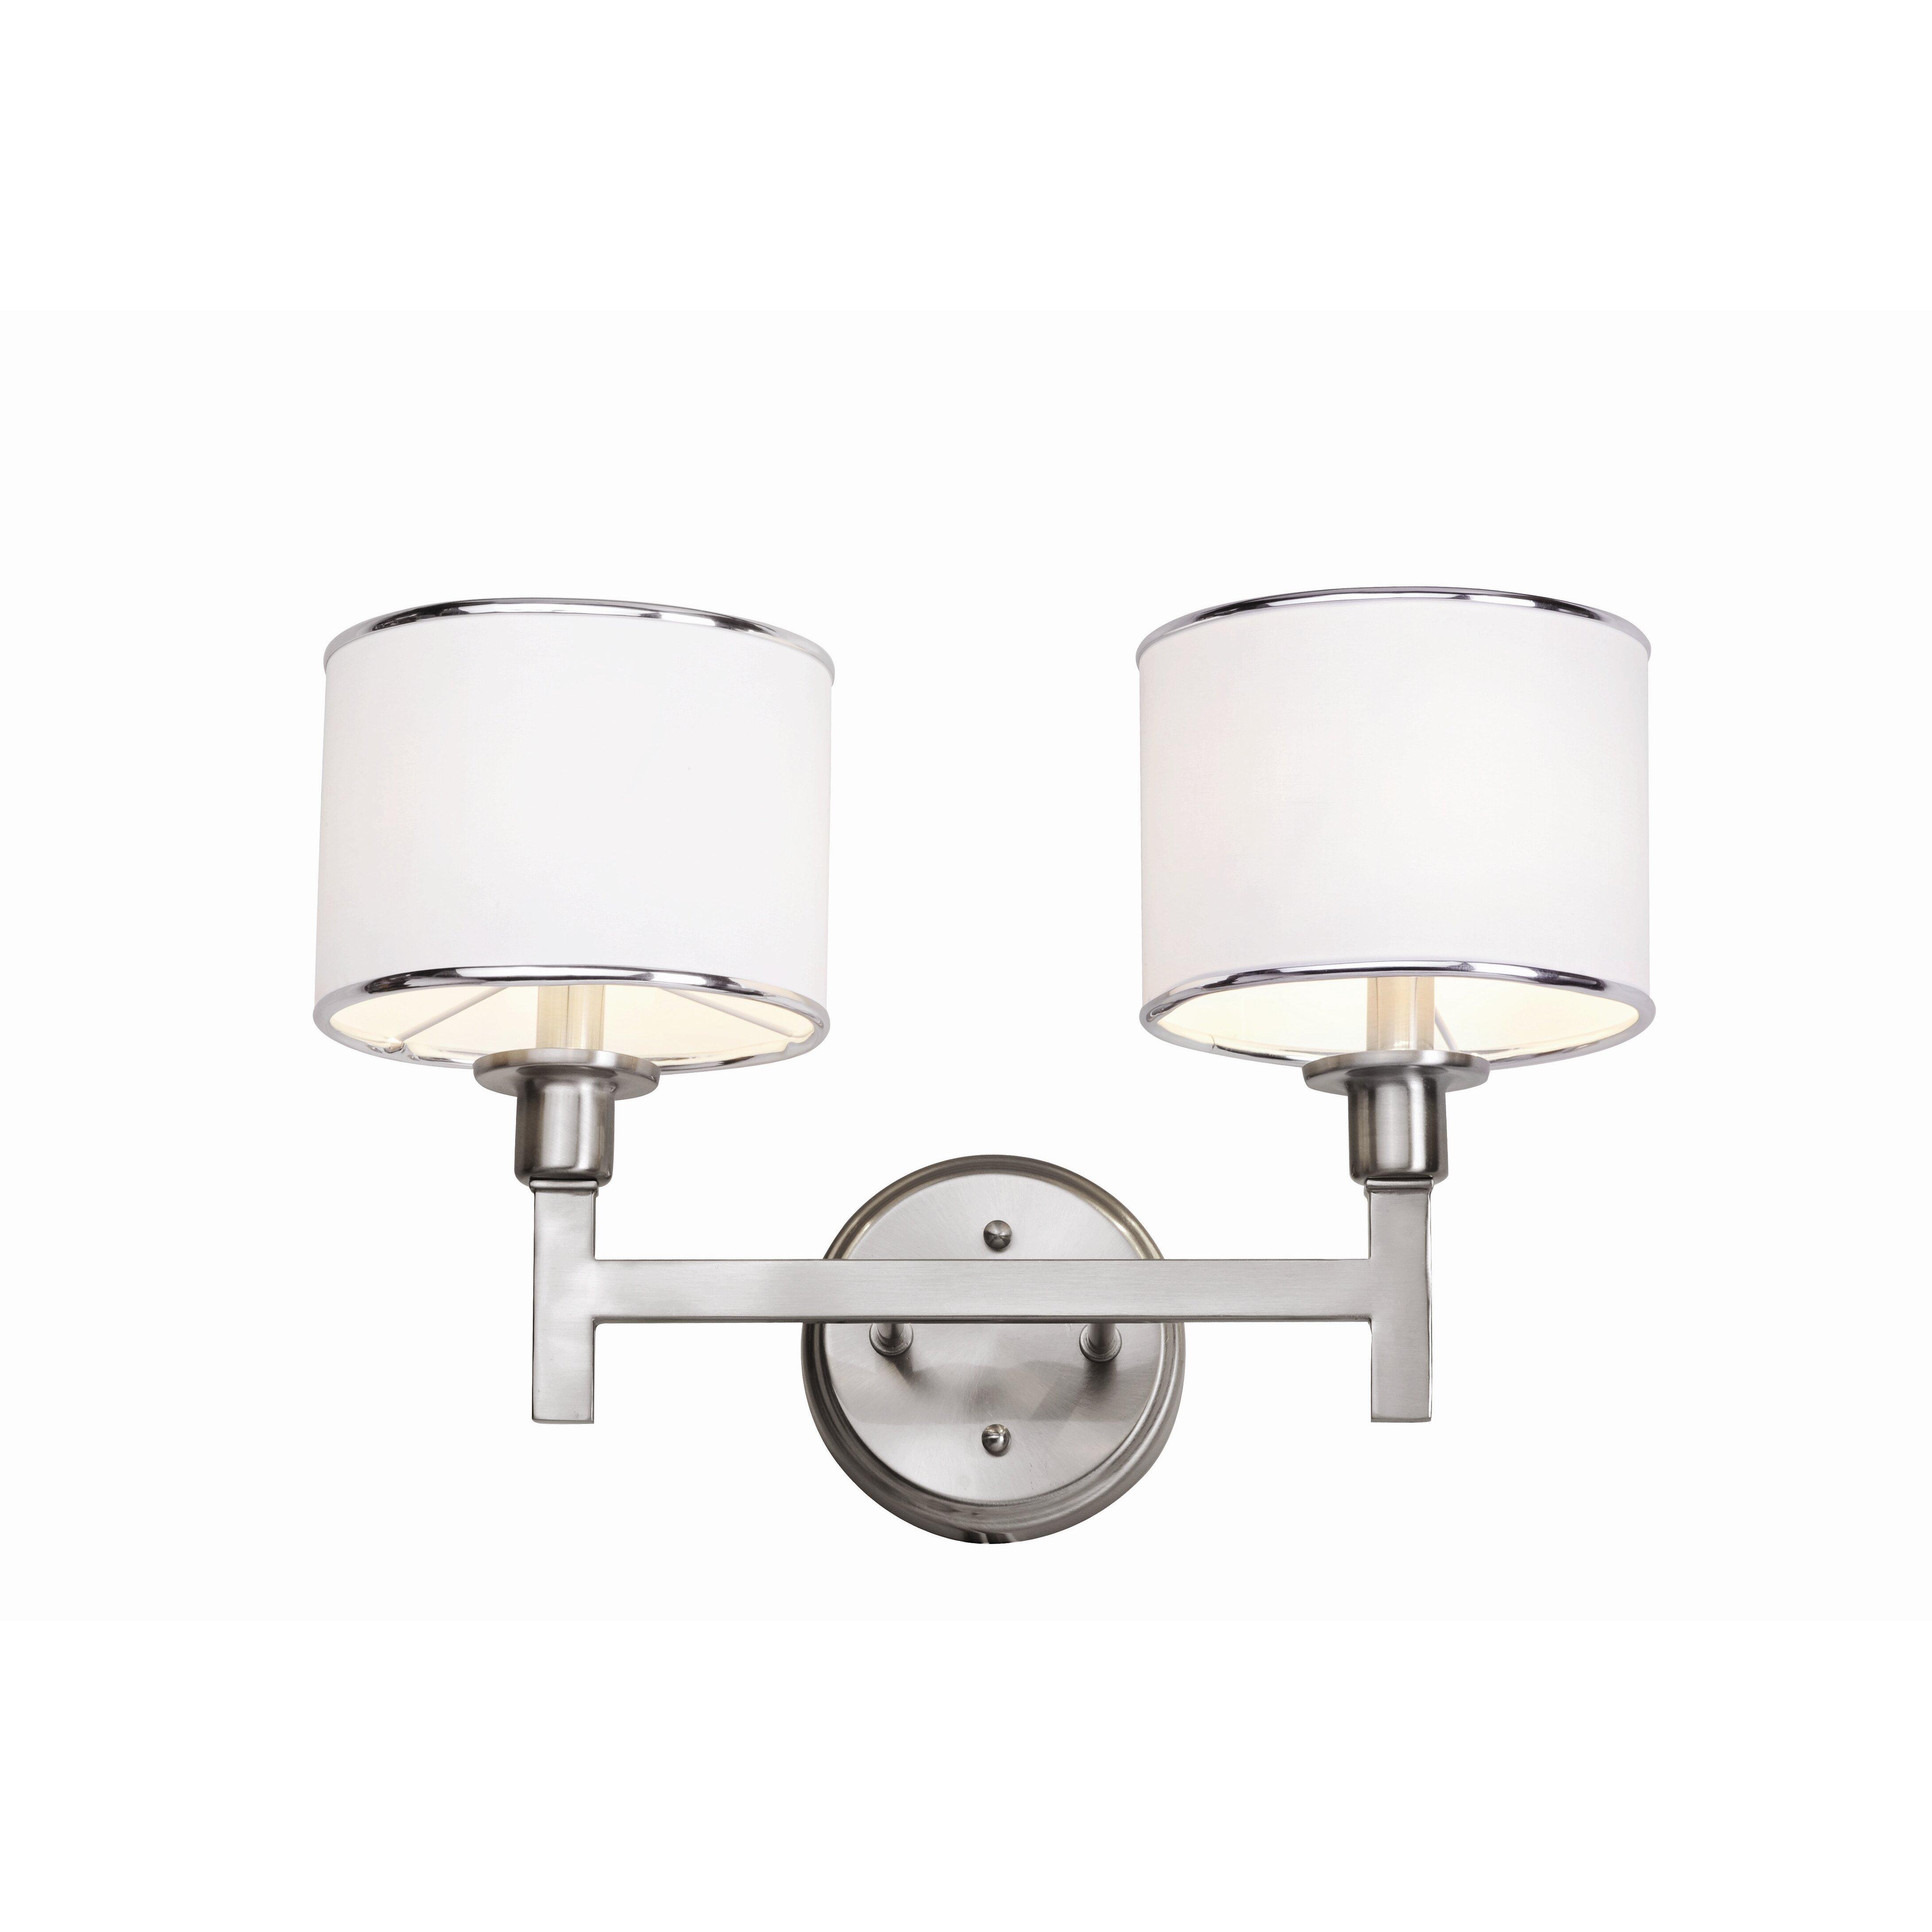 Transglobe Lighting Cadence 2 Light Vanity Light Reviews Wayfair